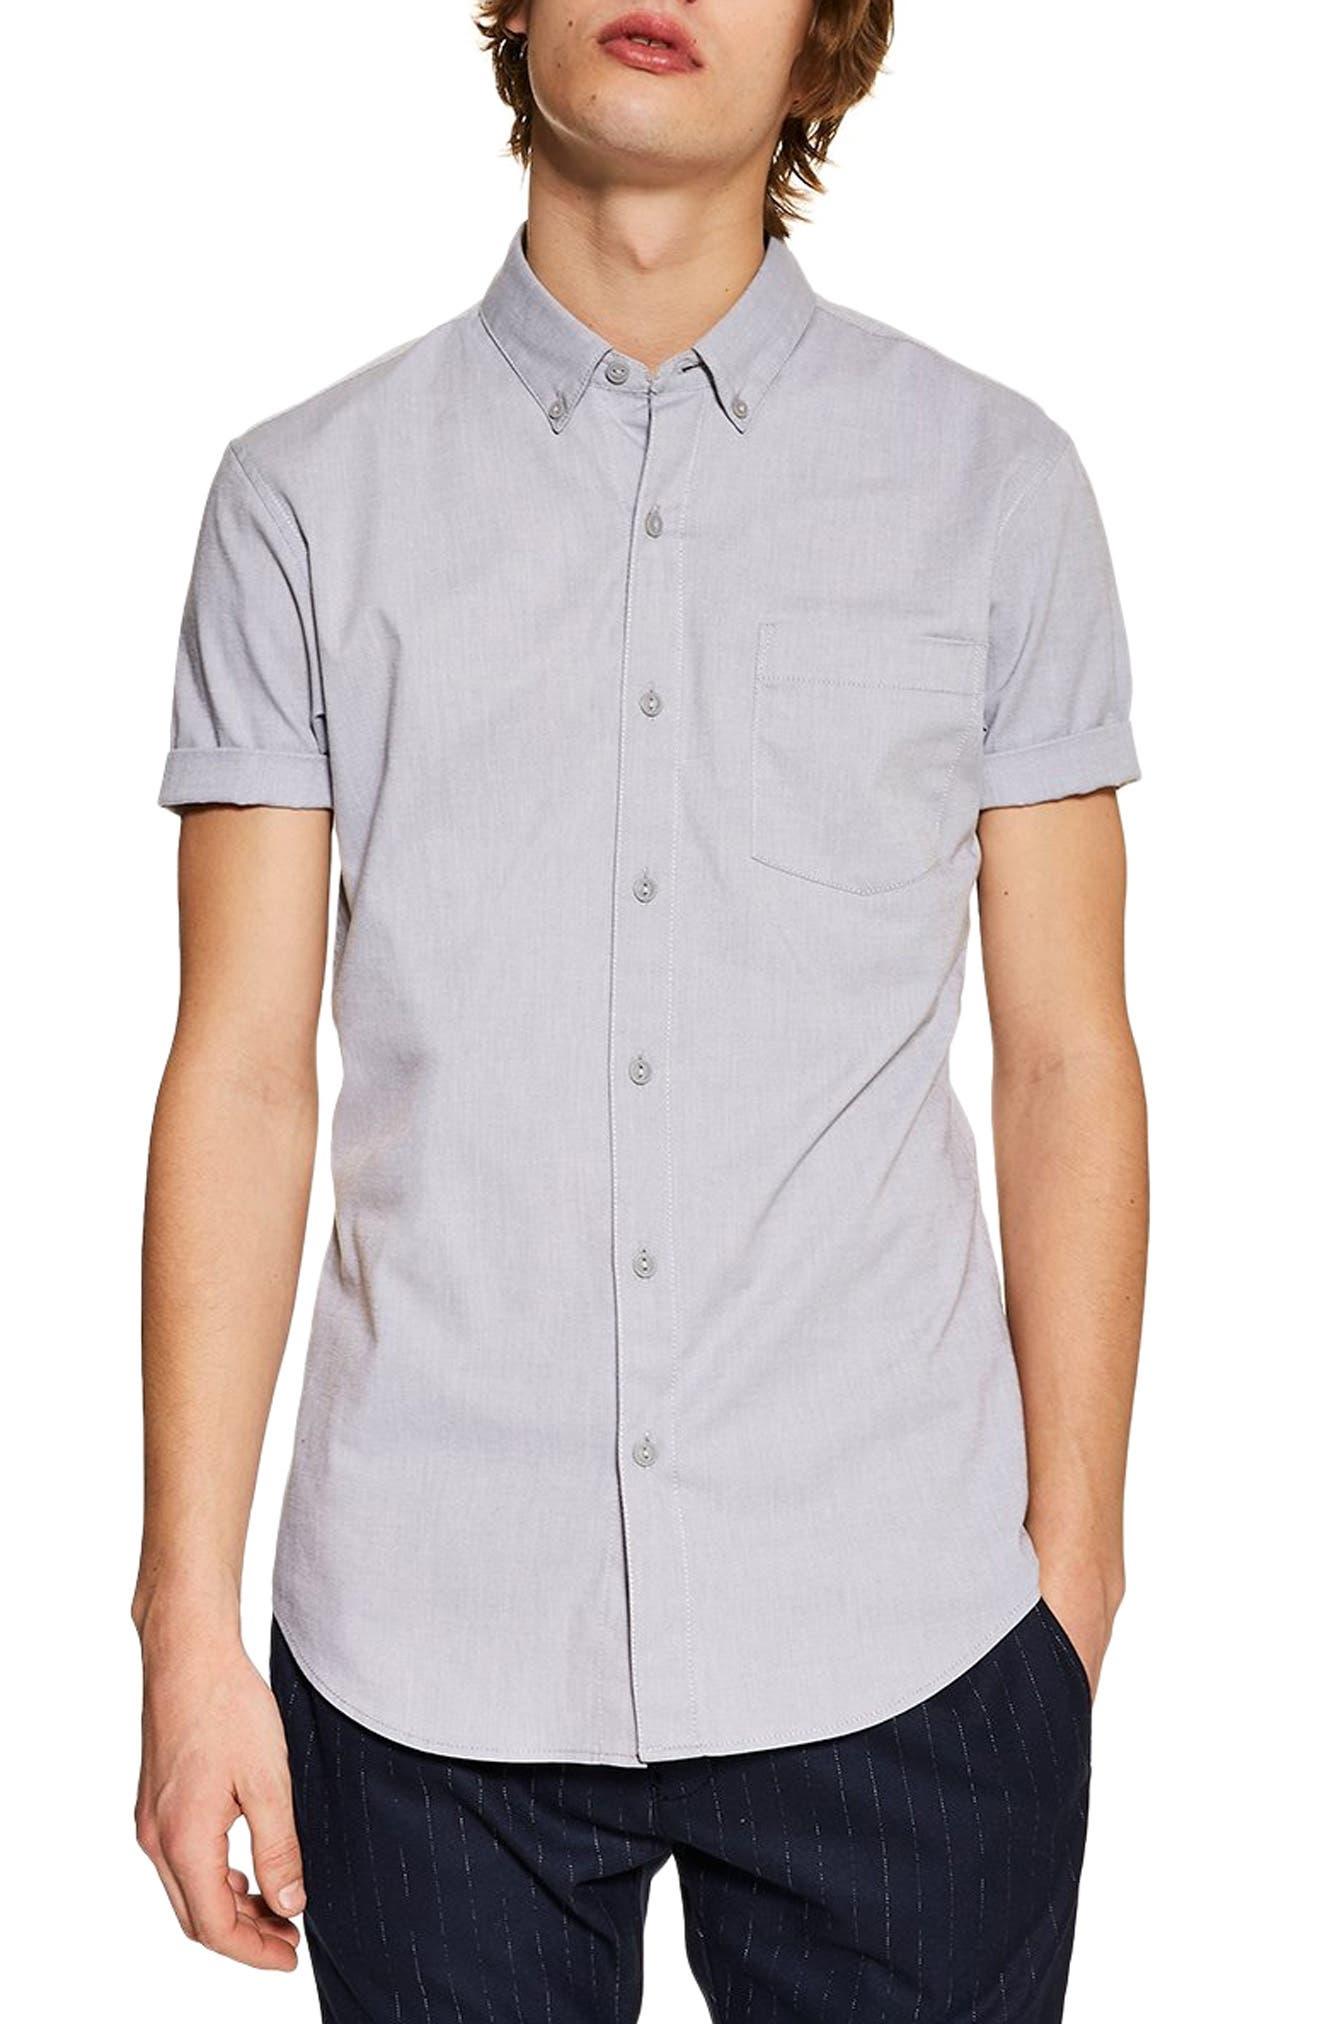 TOPMAN,                             Muscle Fit Oxford Shirt,                             Main thumbnail 1, color,                             GREY